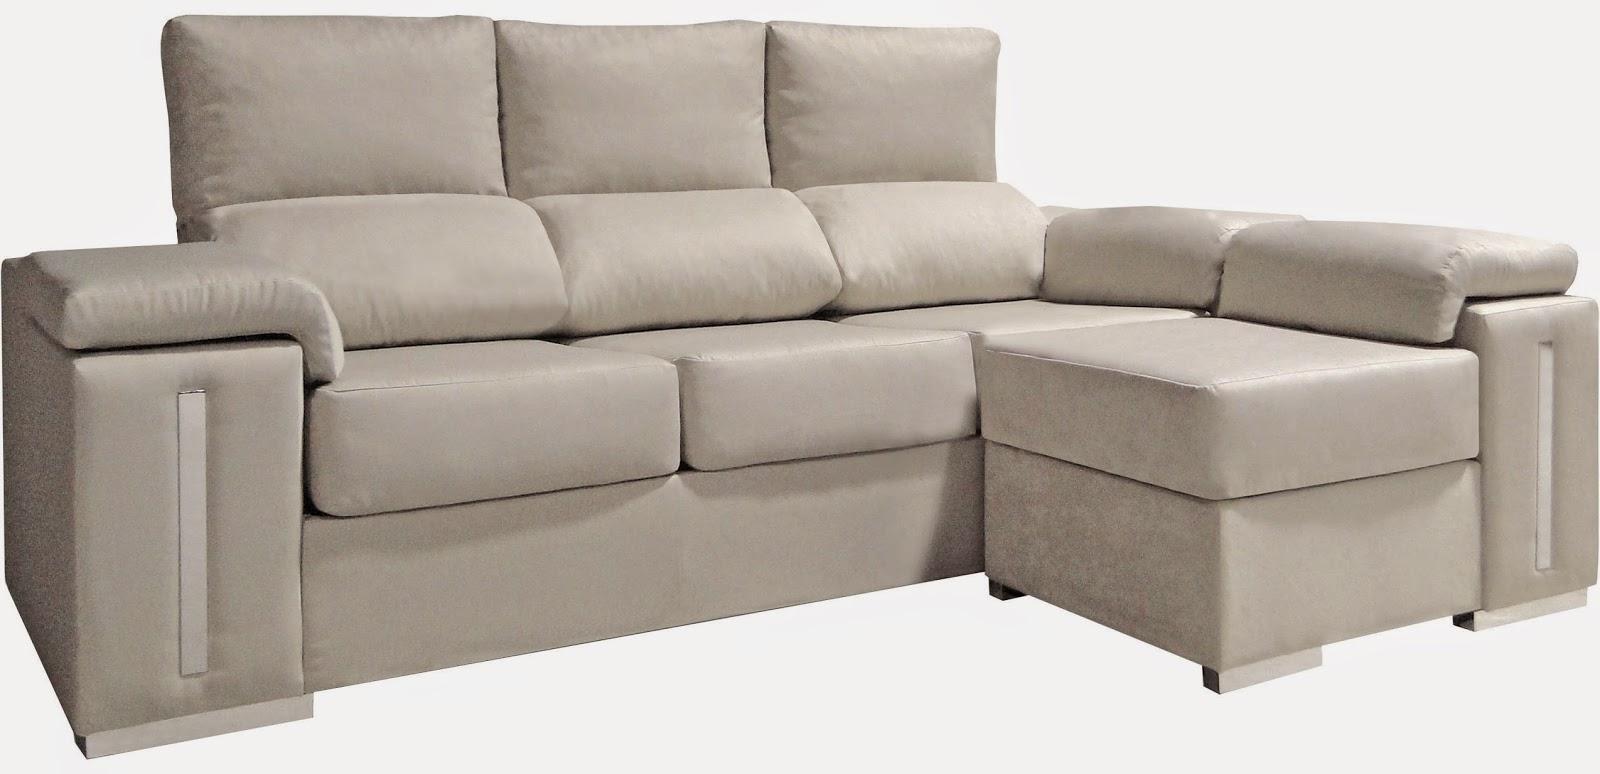 Muebles f y m ourense sofa chaiselongue rinconera te ayudamos a decidir - Muebles ourense ...